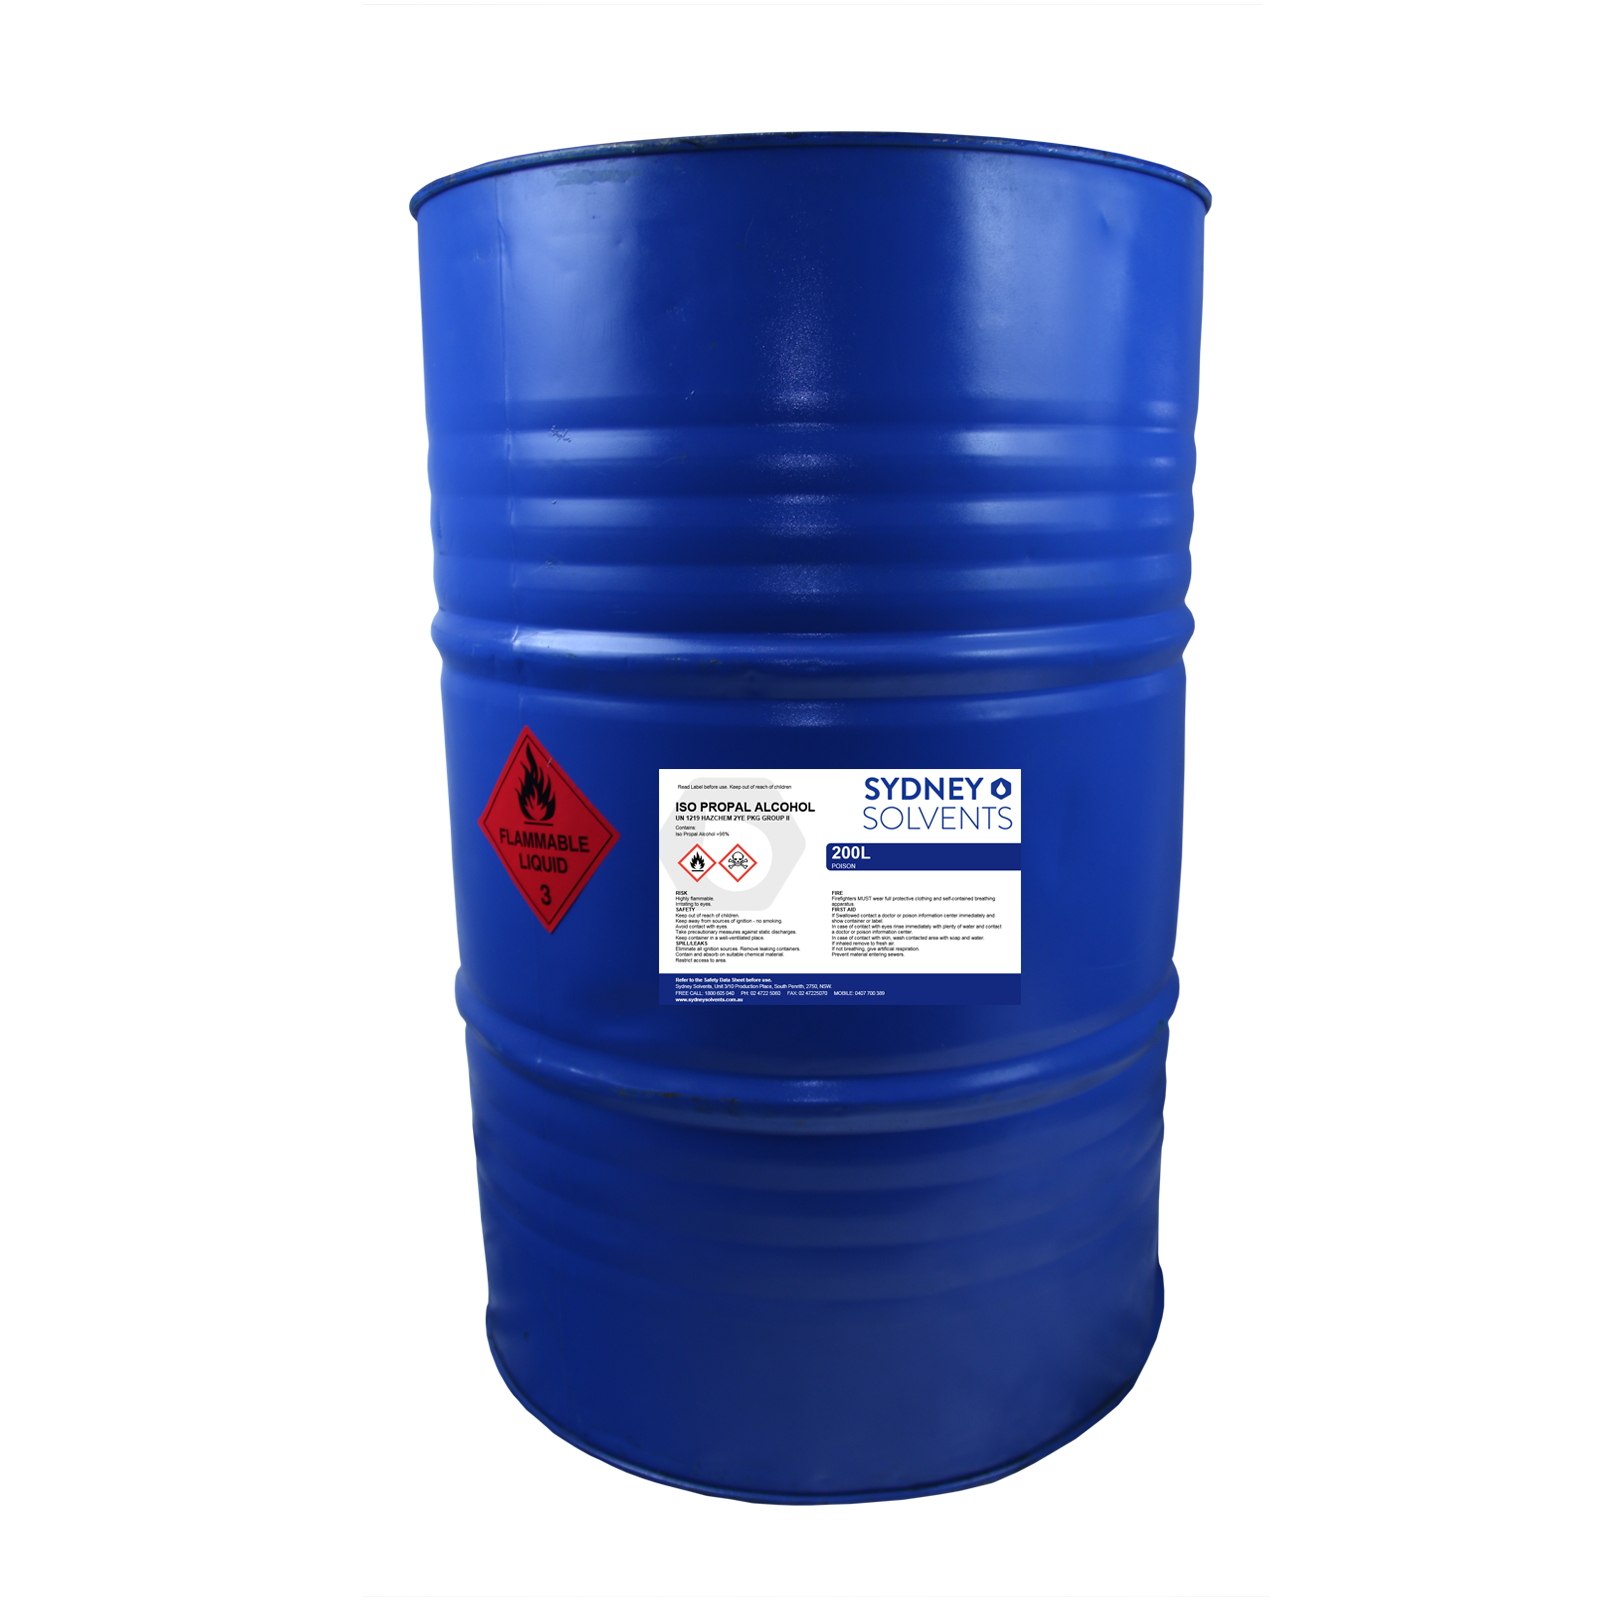 IPA / Isopropyl alcohol